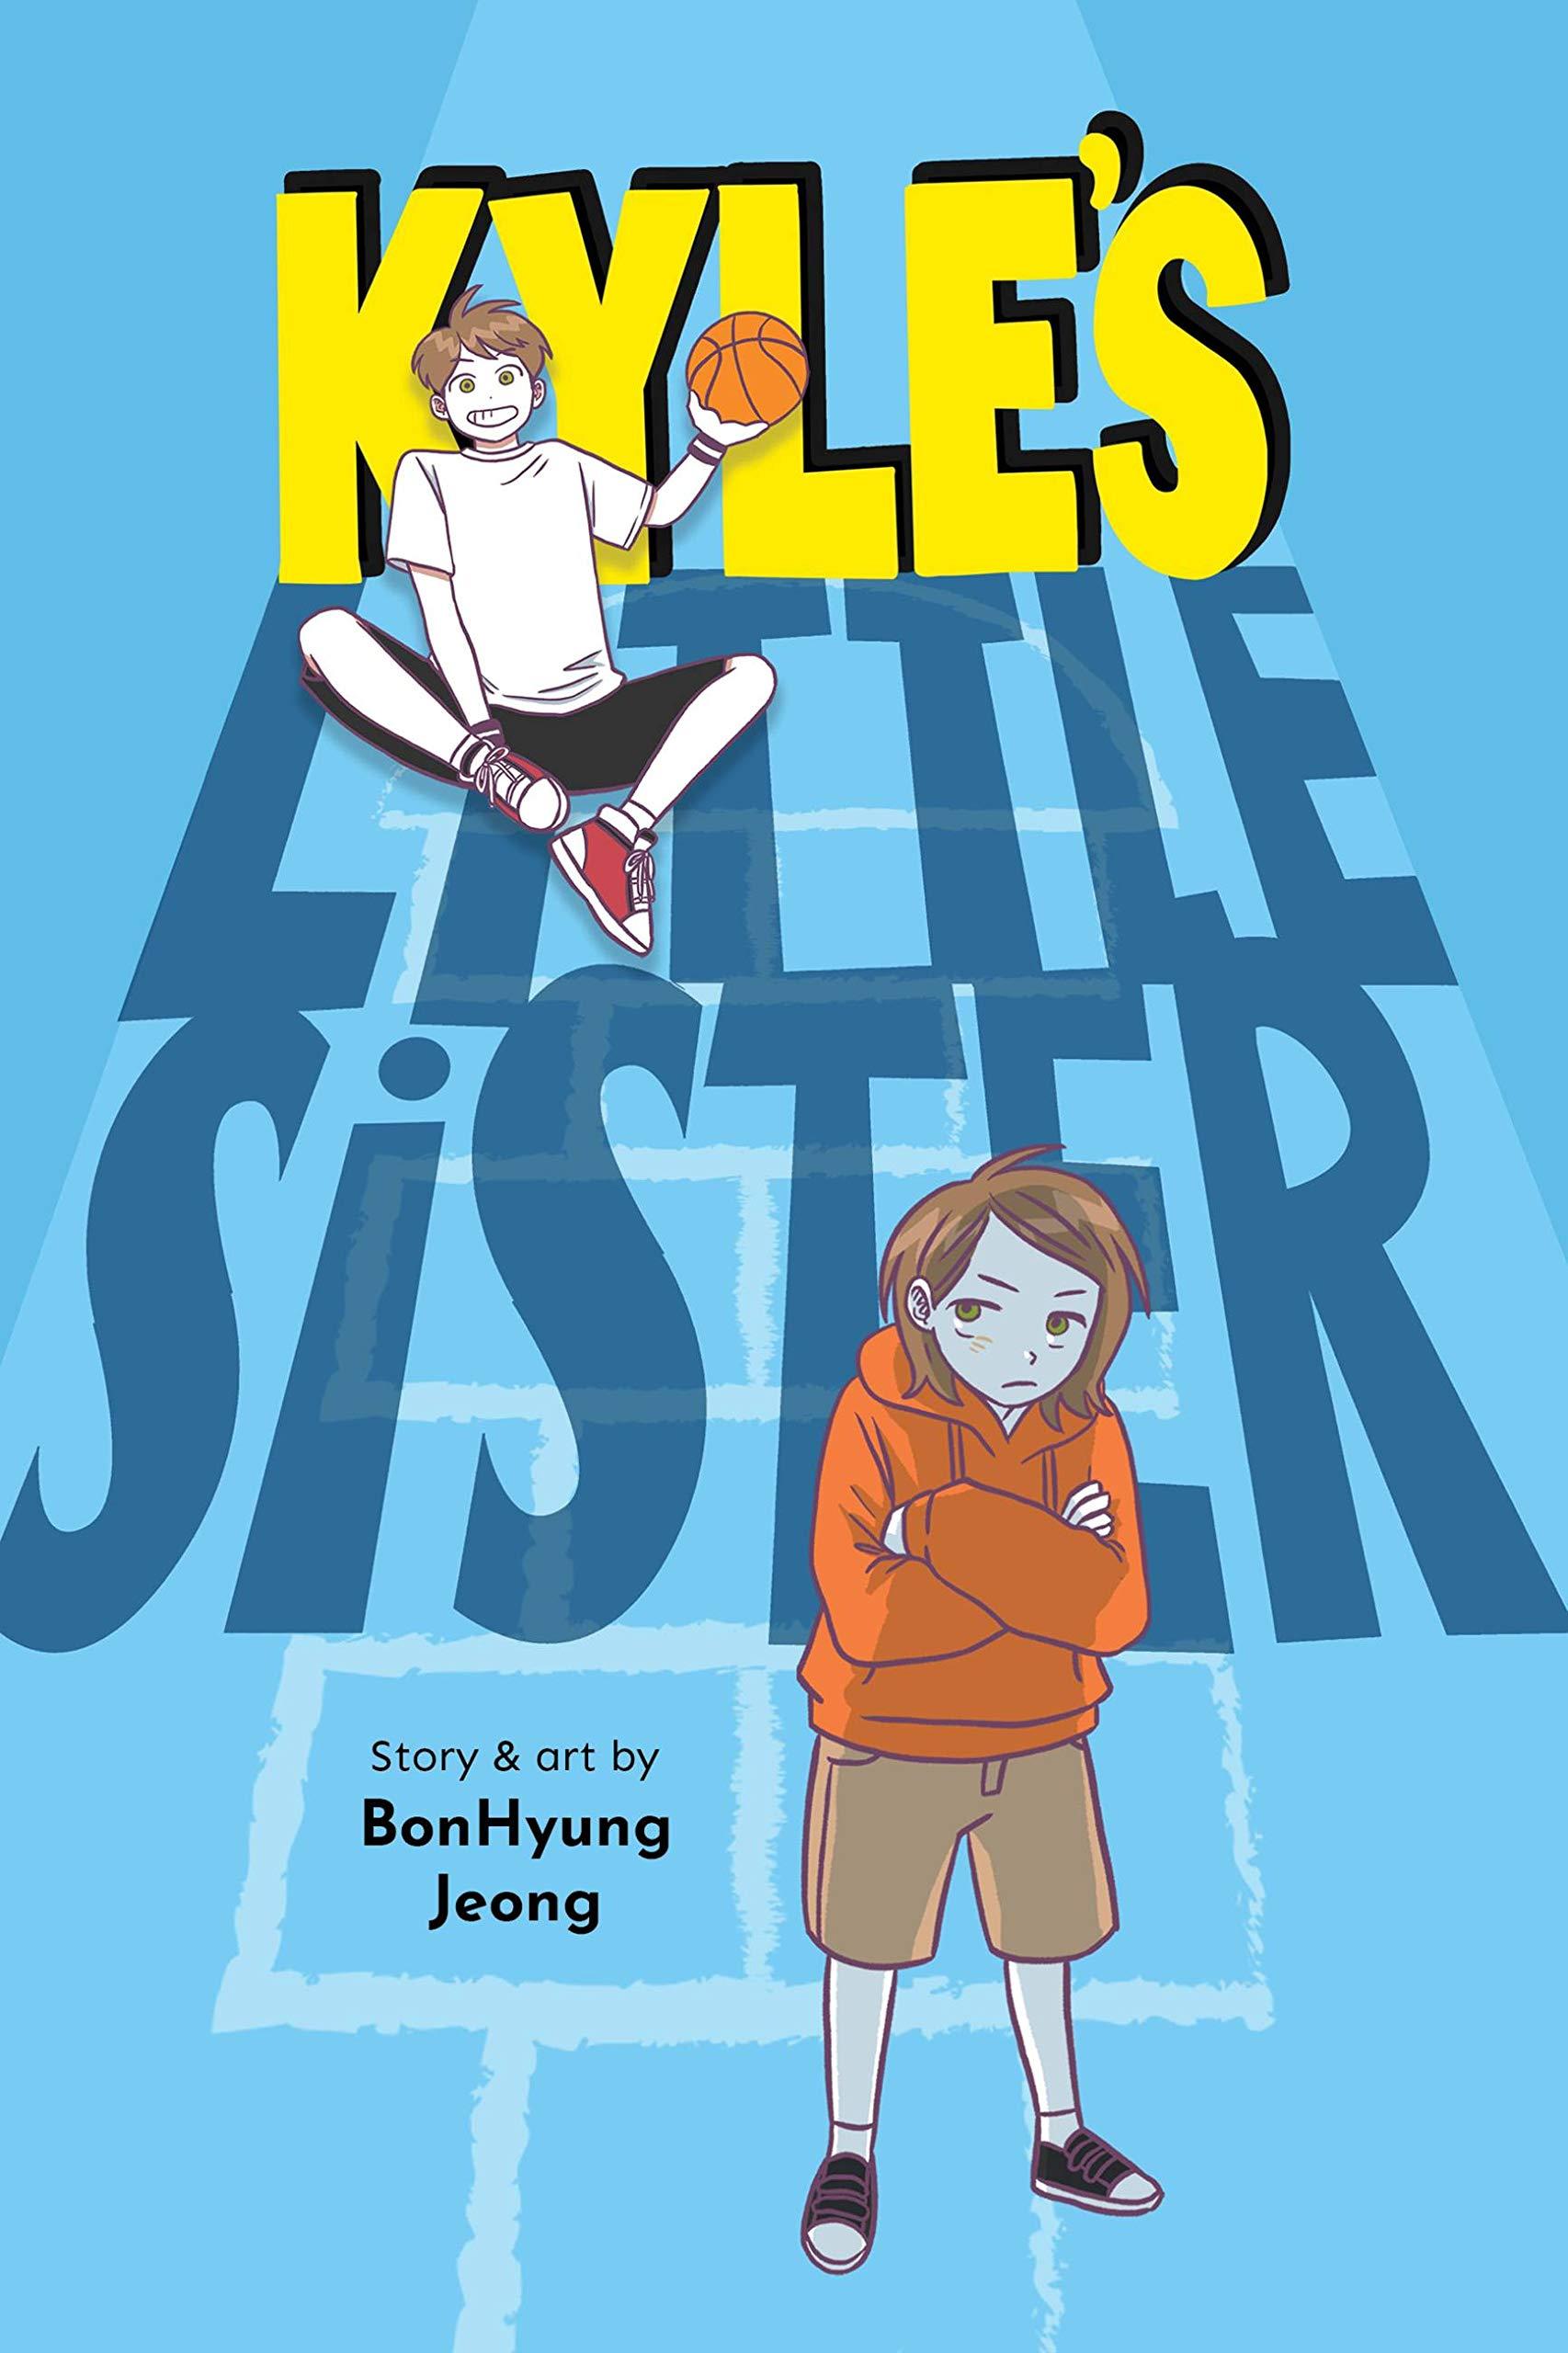 Kyle's Little Sister: Jeong, BonHyung: 9781975316549: Amazon.com: Books